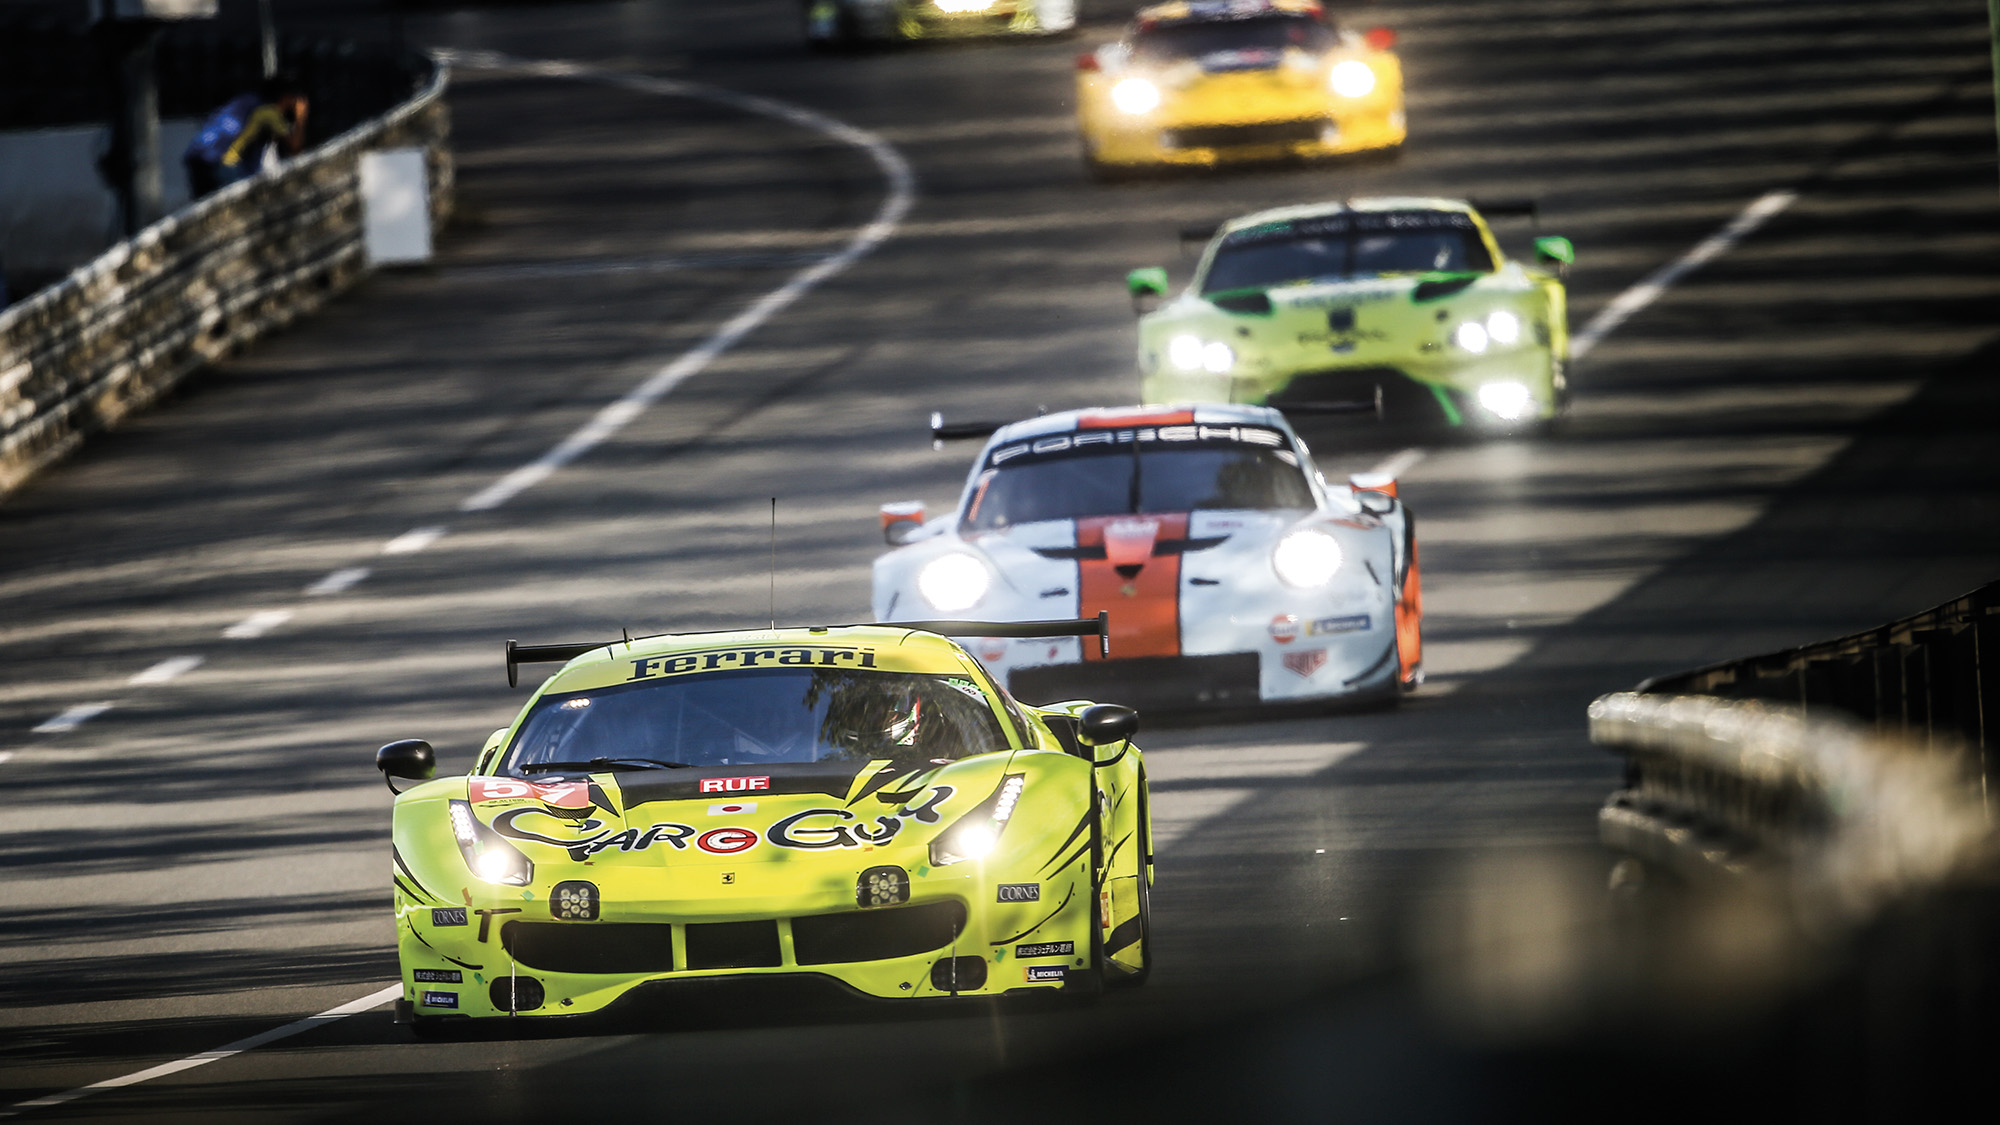 Ferrari Porsche and Aston Martin GT cars at the Le Mans 24 Hours